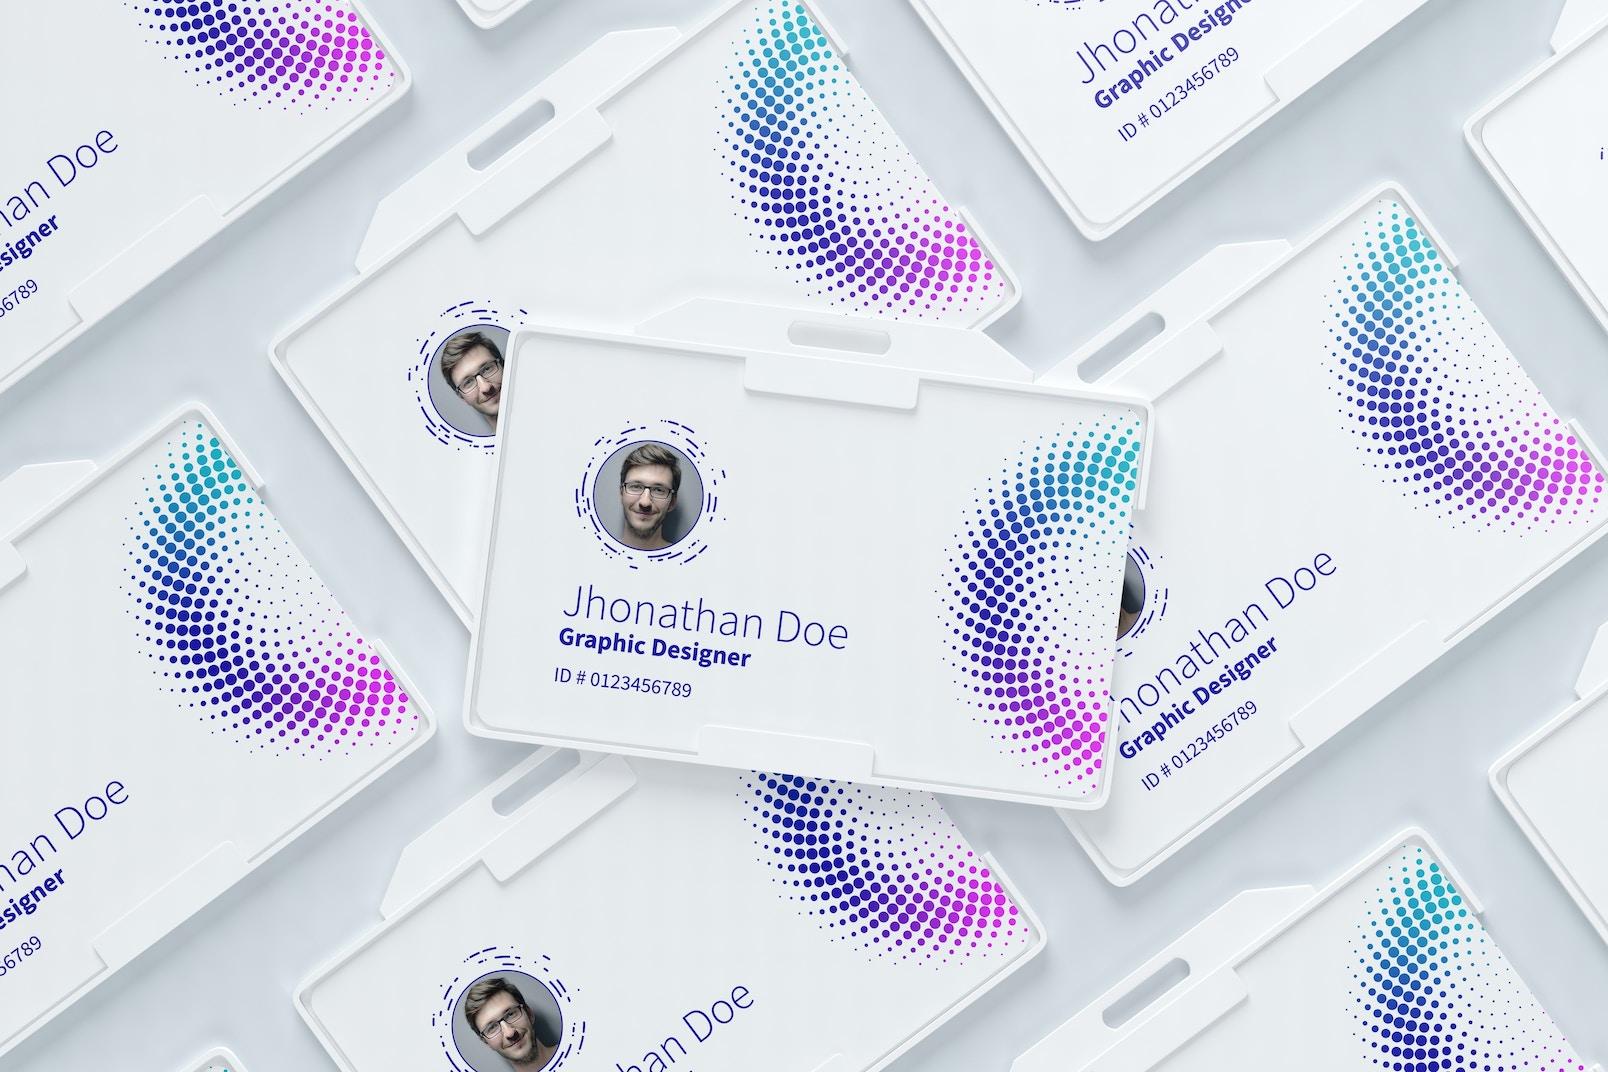 ID Card Mockup 01